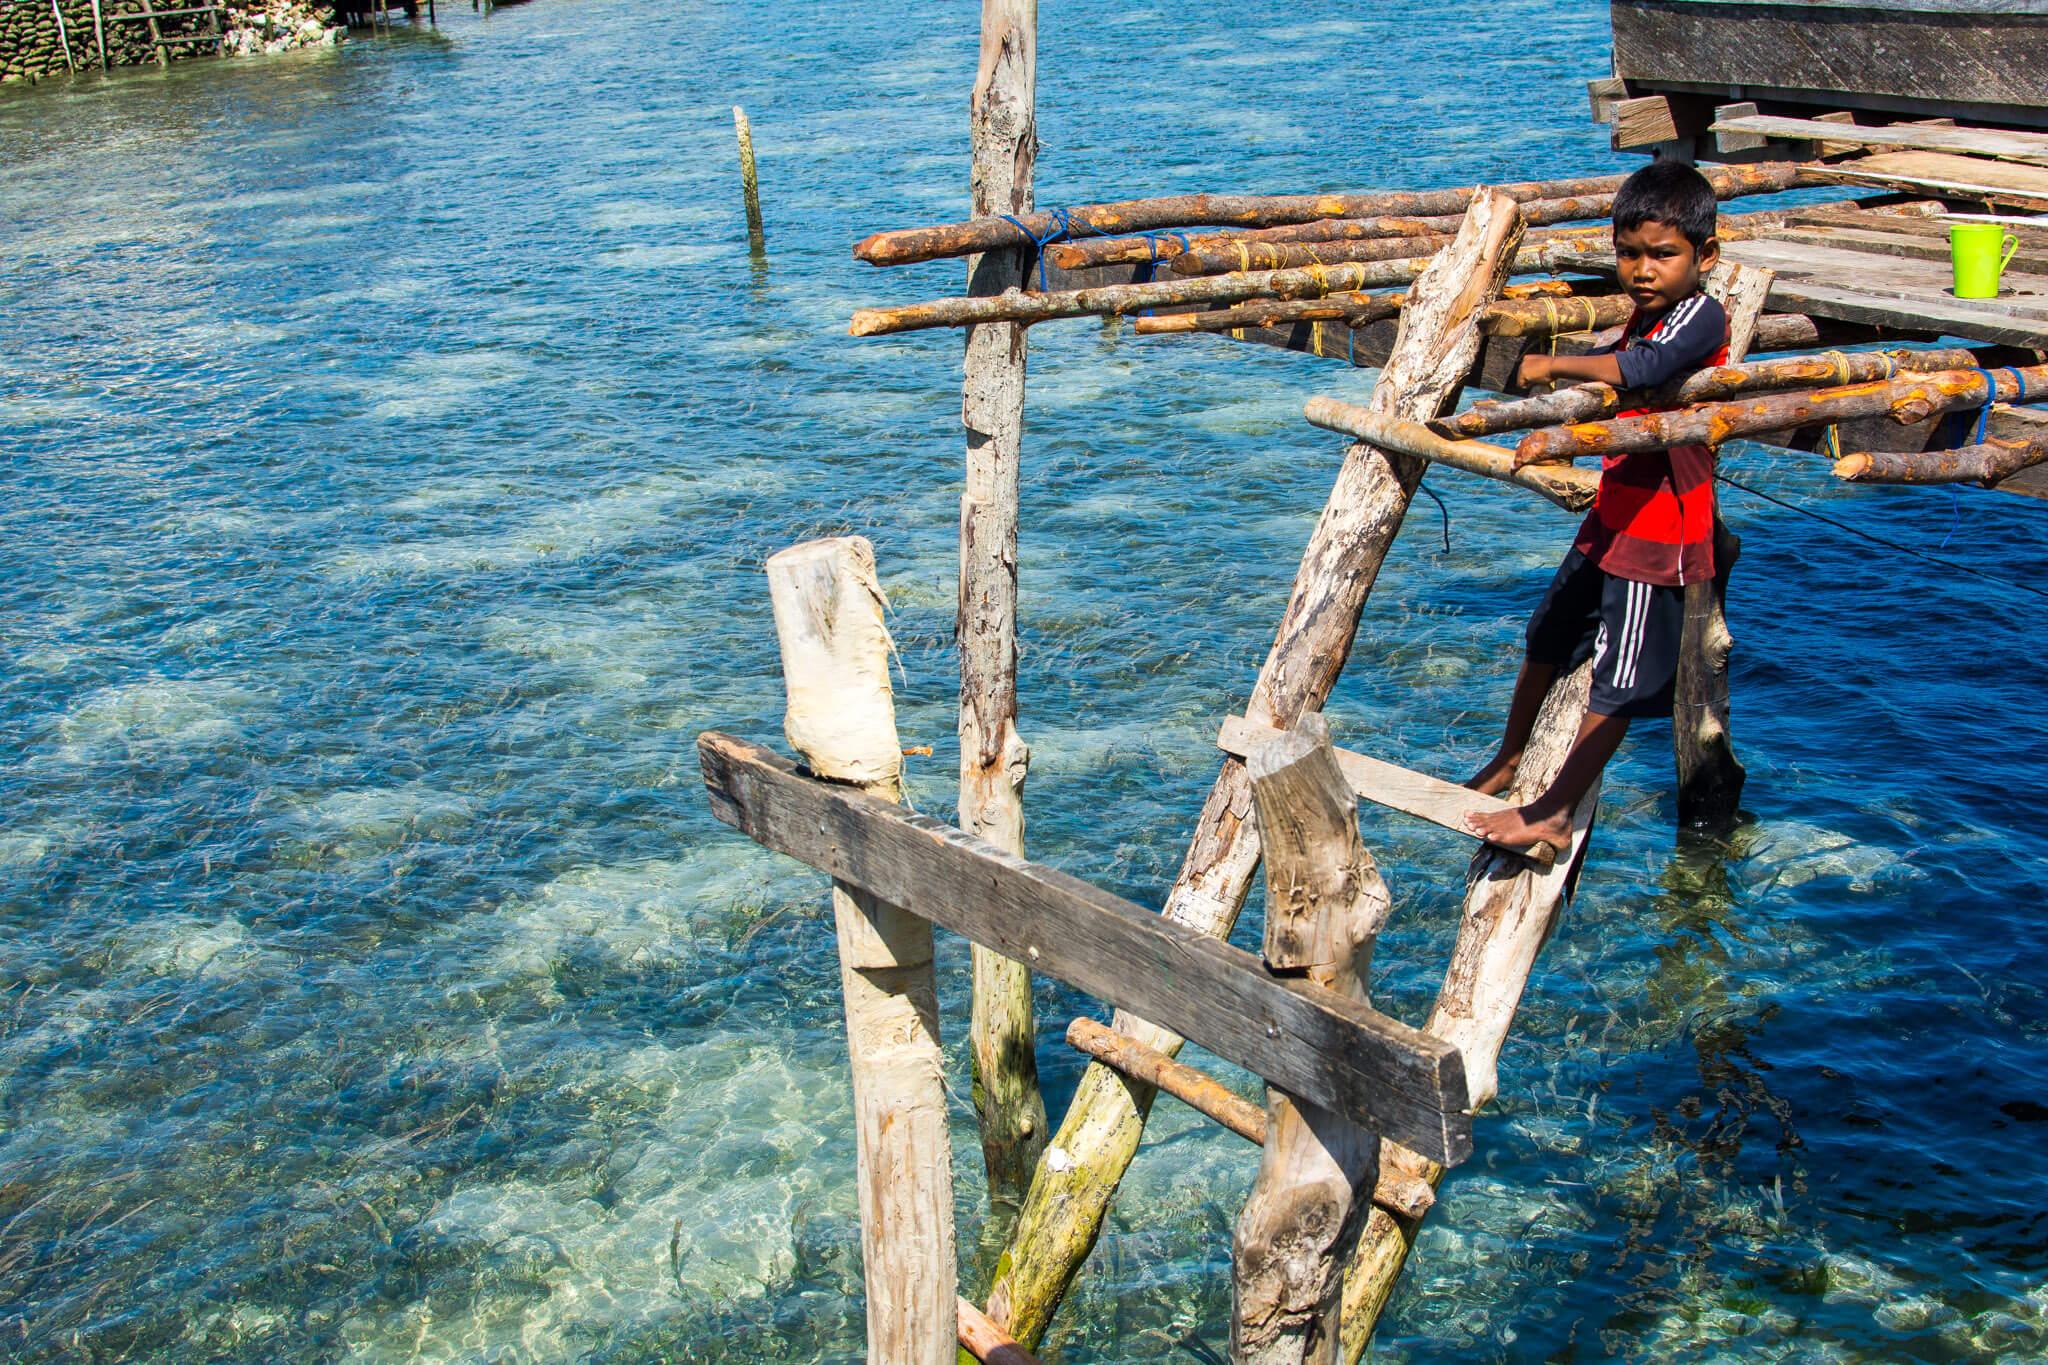 The Bajo People of Wakatobi, Indonesia